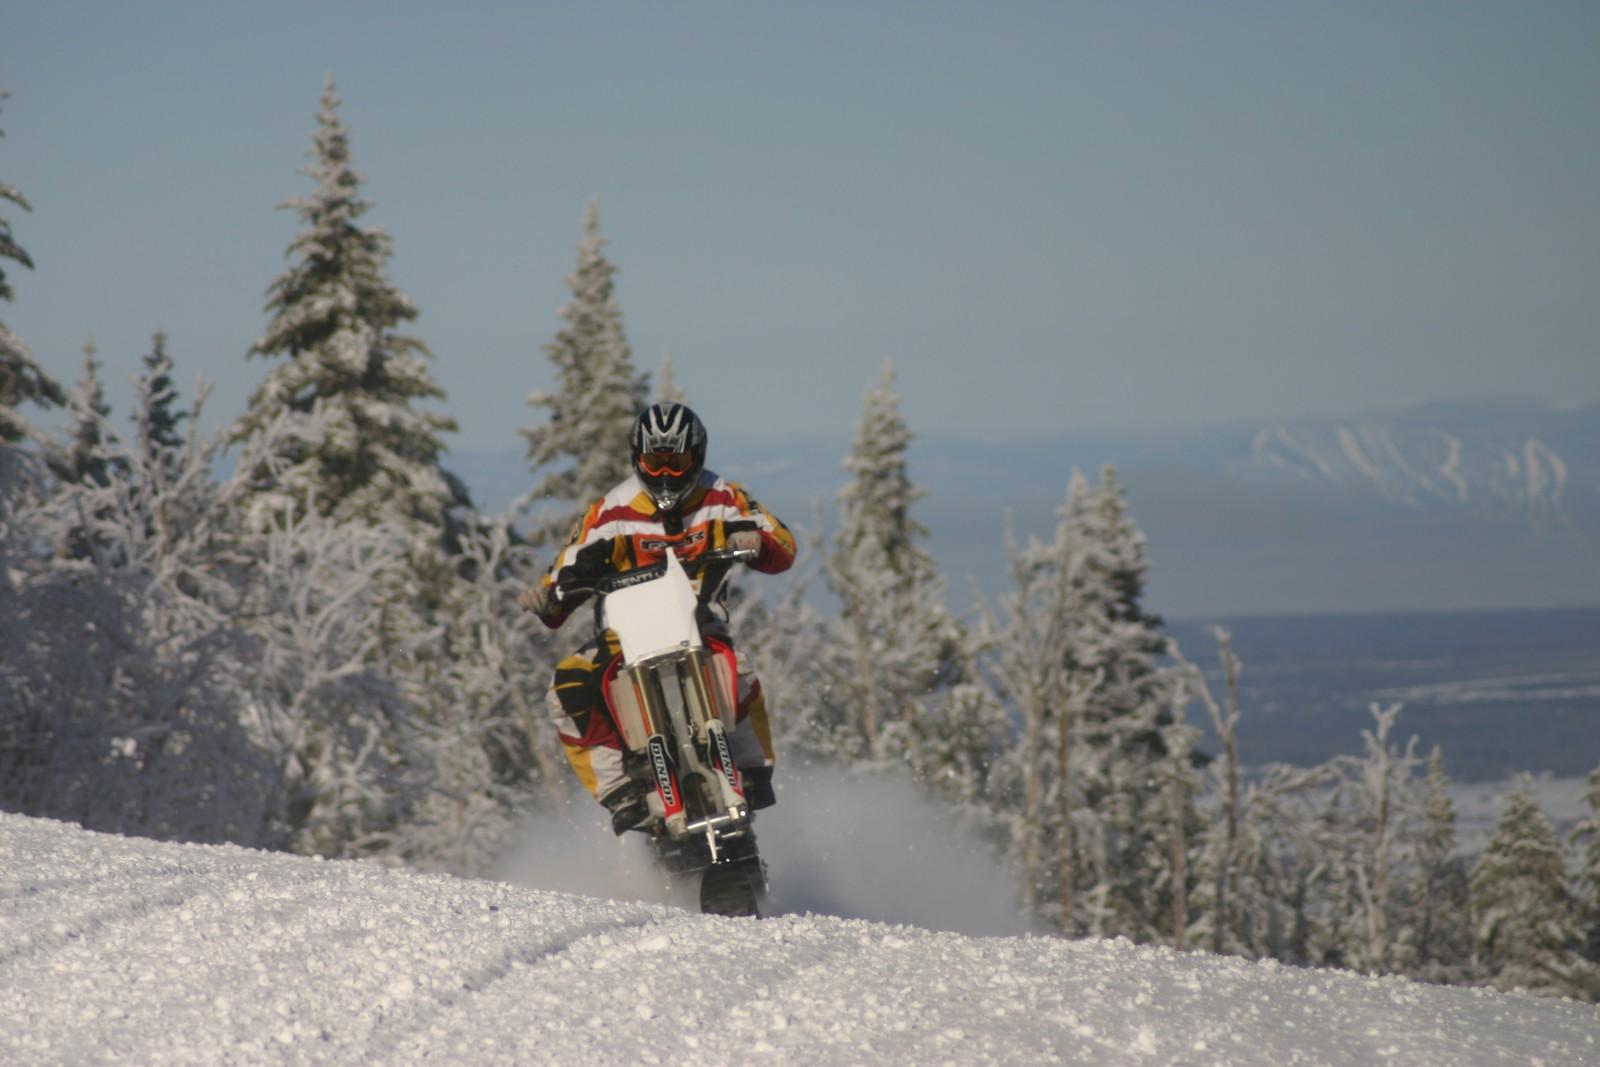 Explorer-snowbike-track-system-for-dirt-bike-supermoto-enduro-mx-AD-Boivin-94-1600x1067